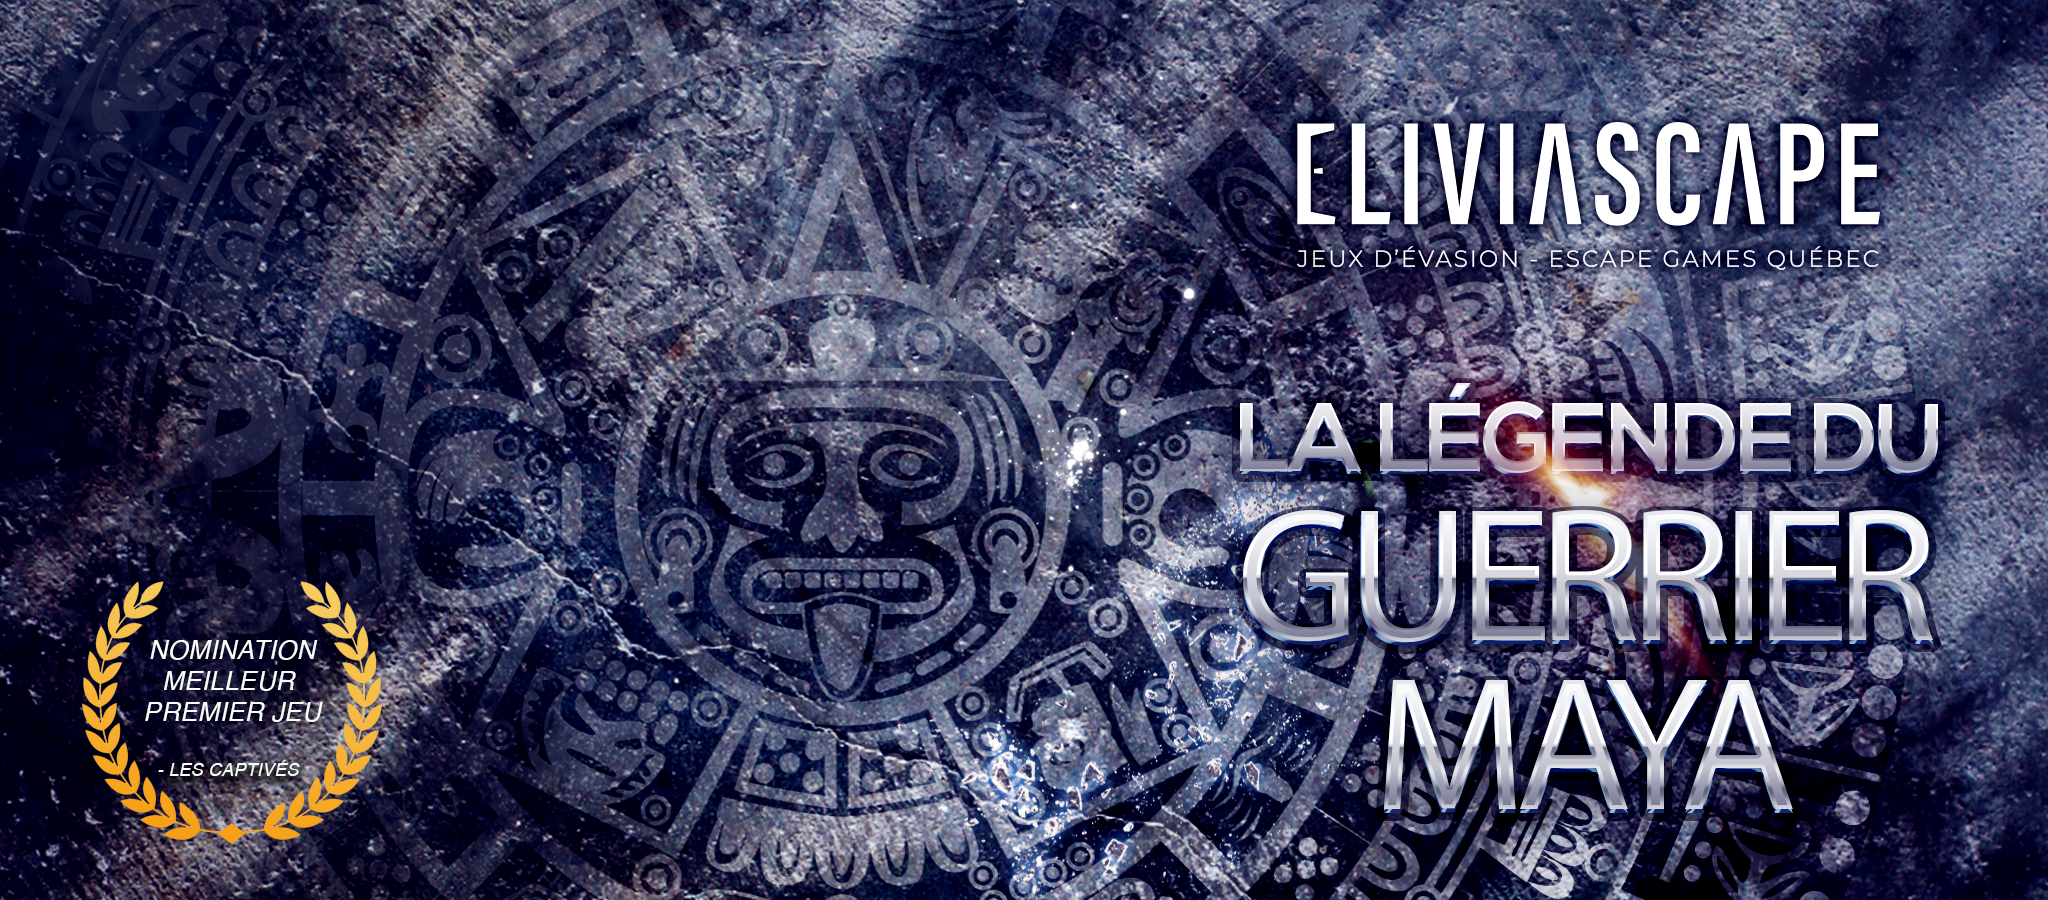 la-legende-du-guerrier-maya-eliviascape-jeu-d-evasion-quebec